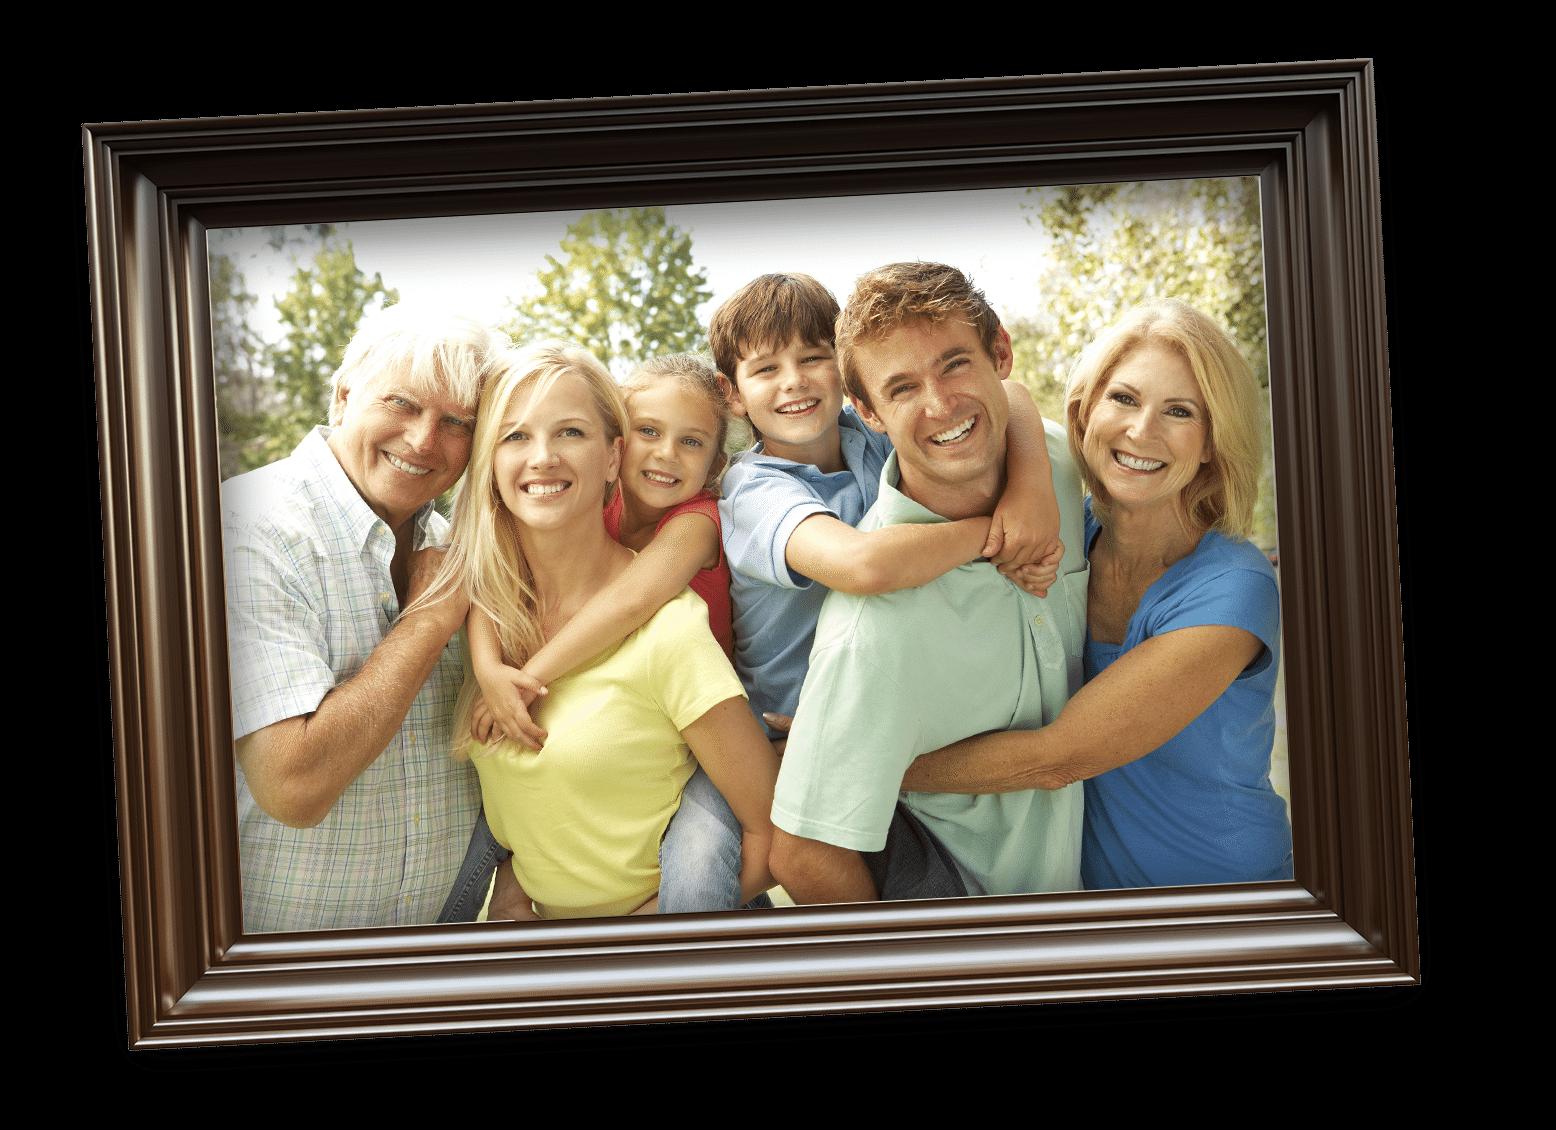 family in frame